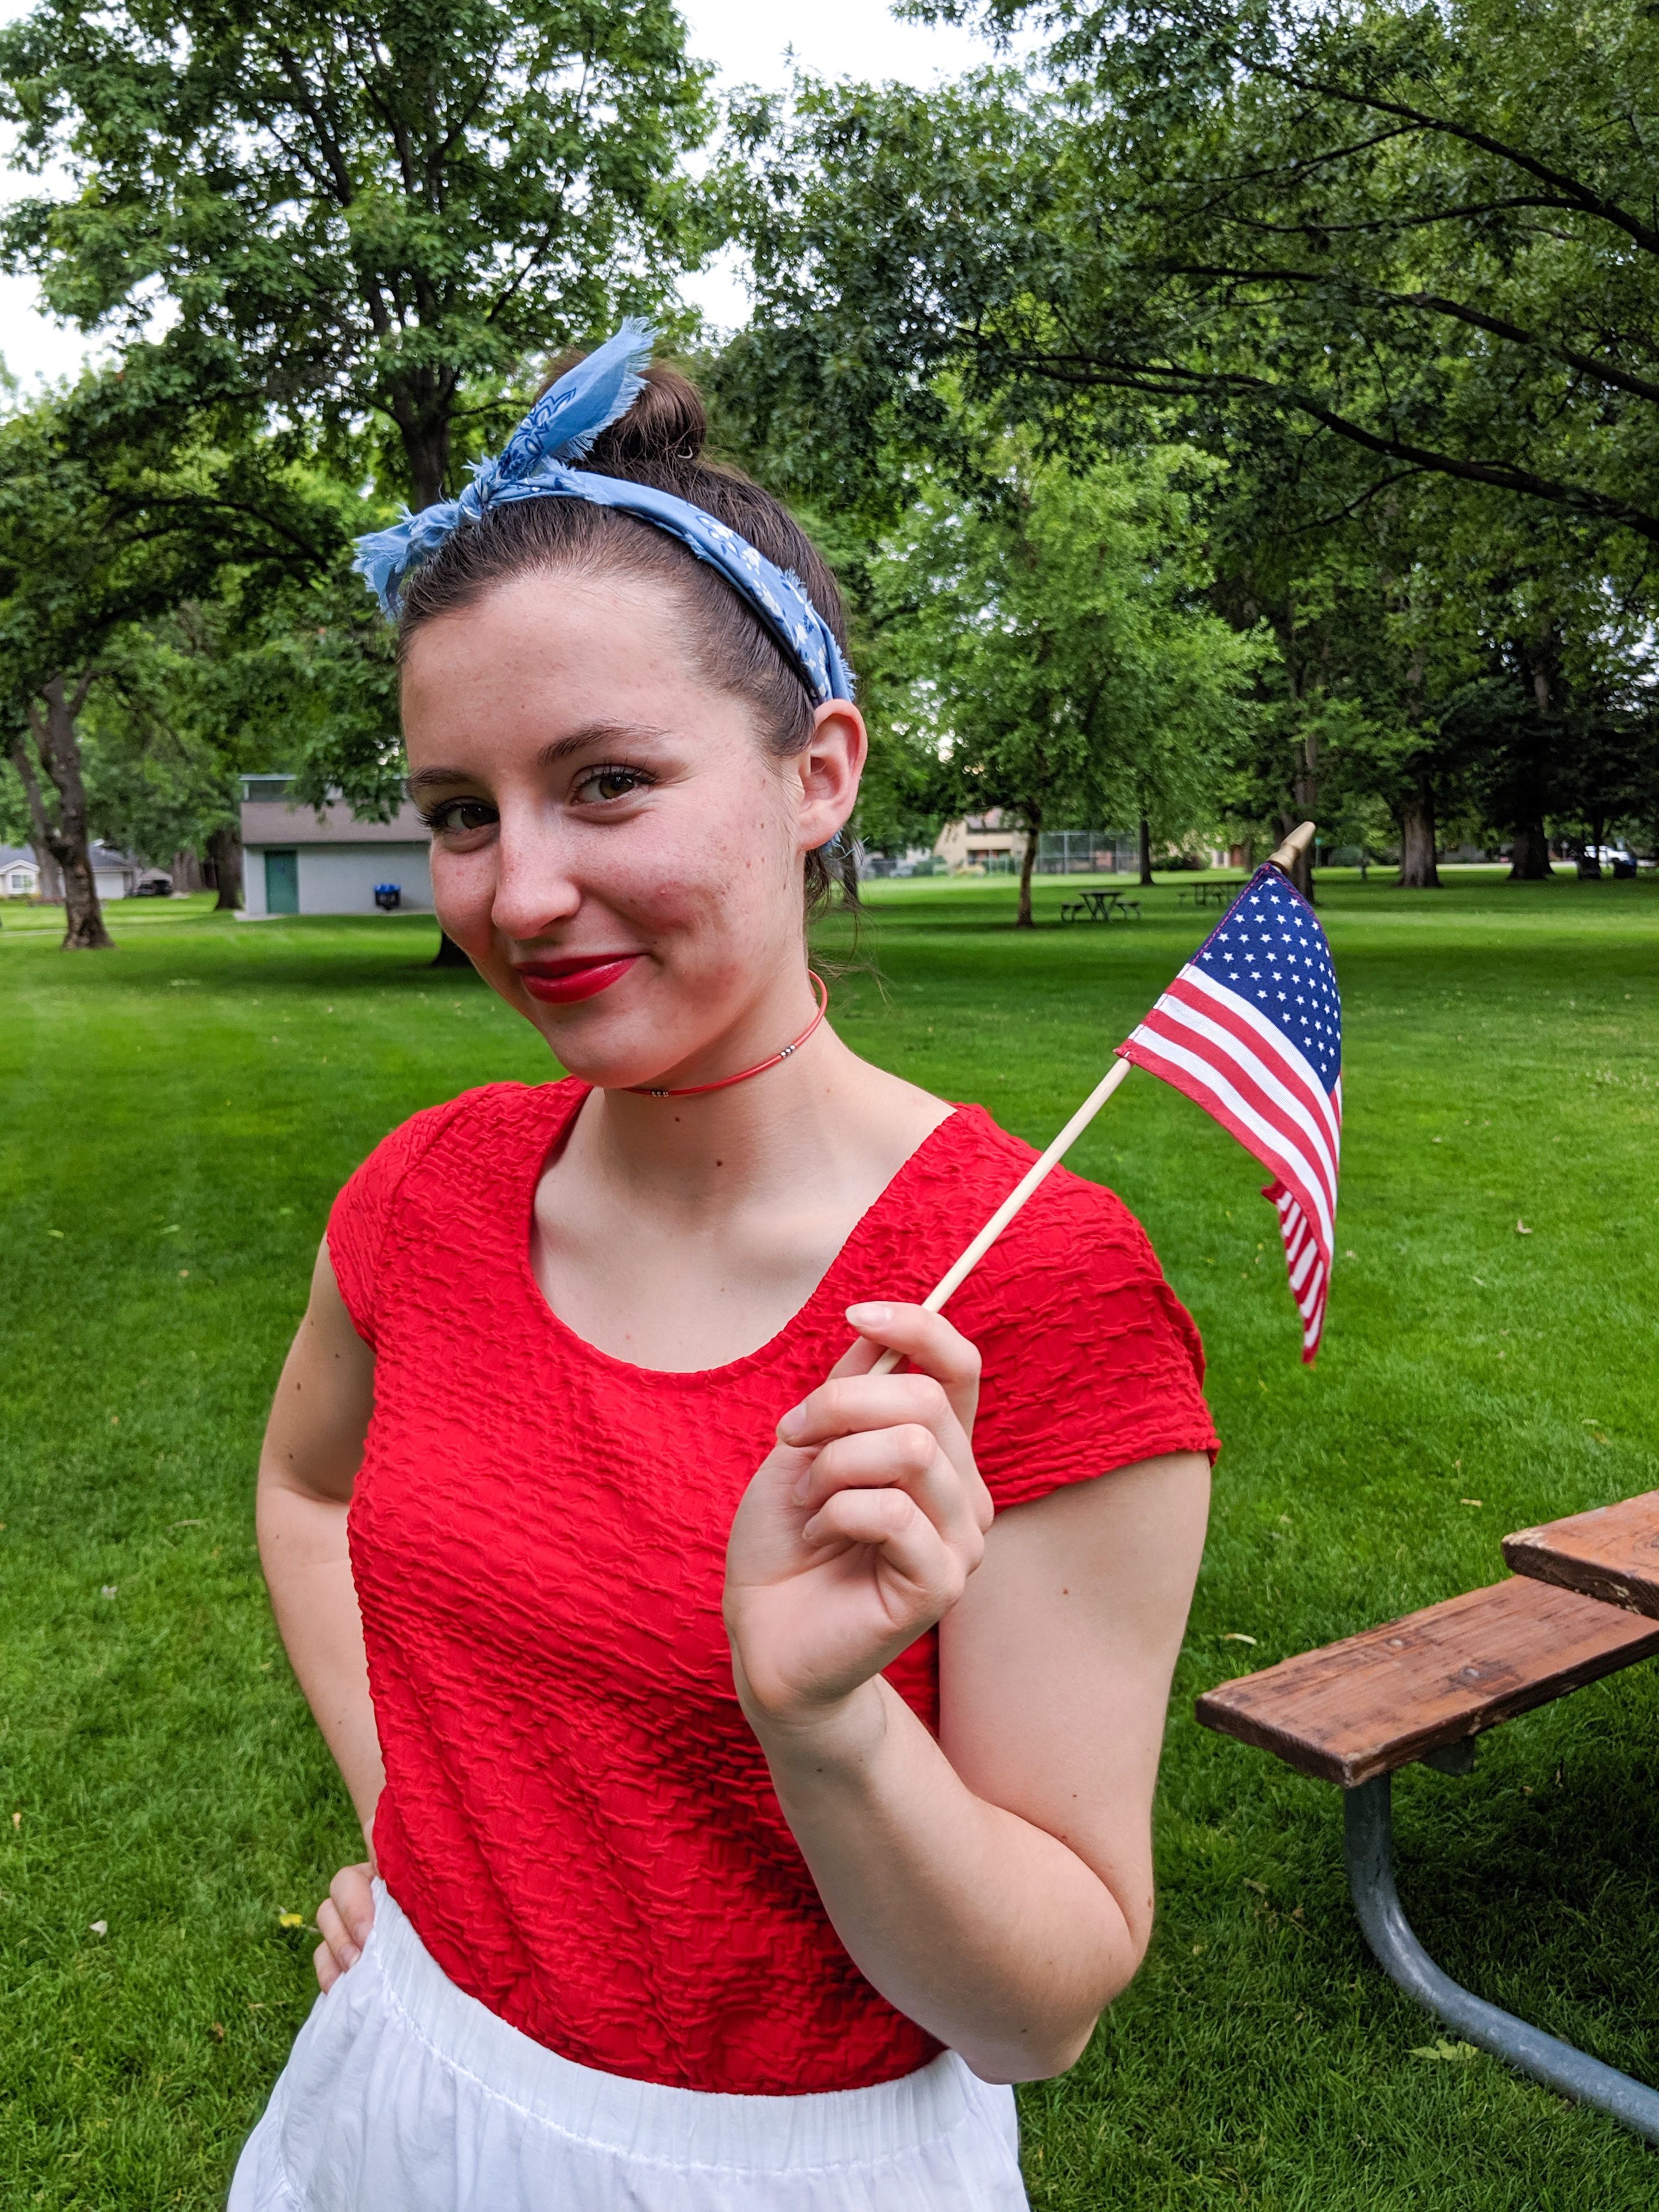 America, U.S.A., 4th of july, ways to celebrate